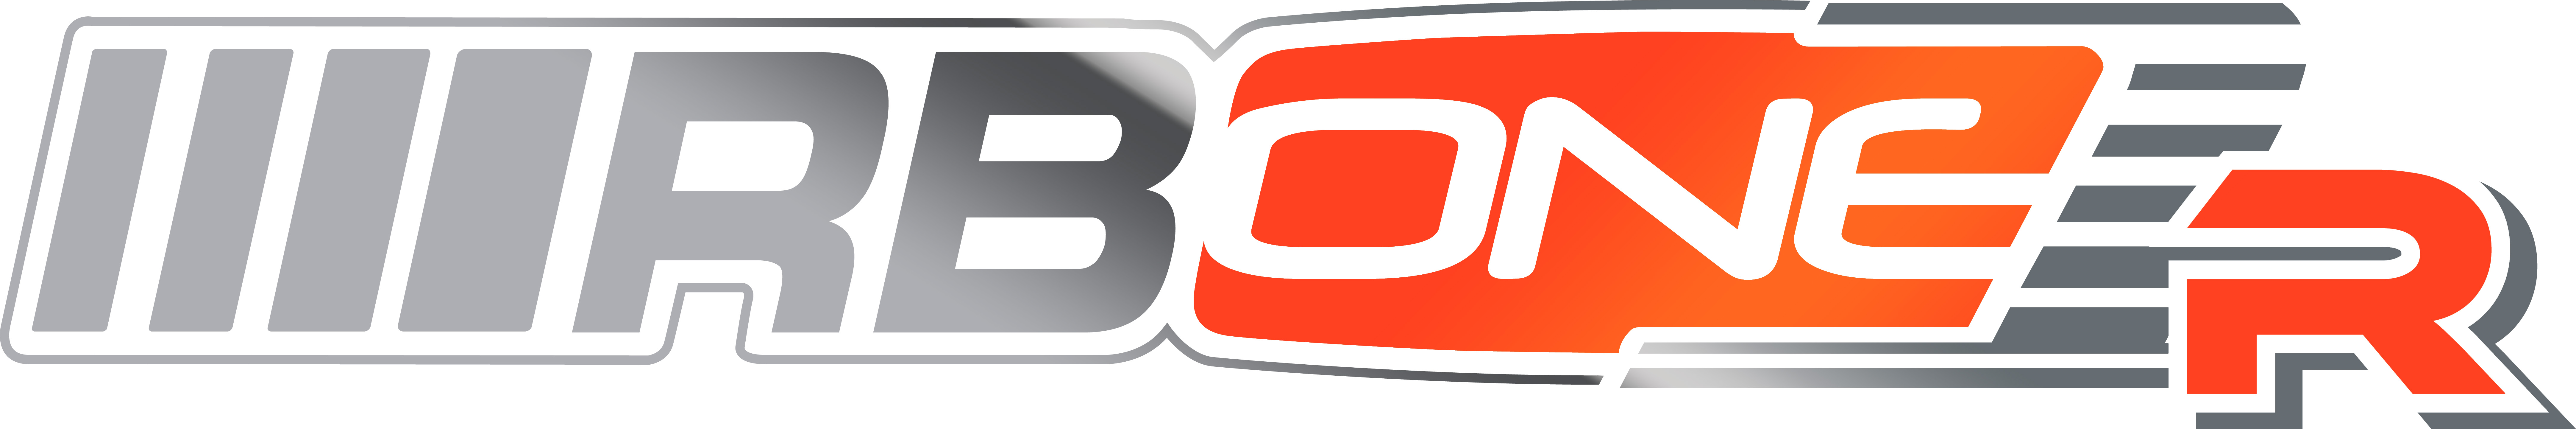 2017 ? Rboner_logo